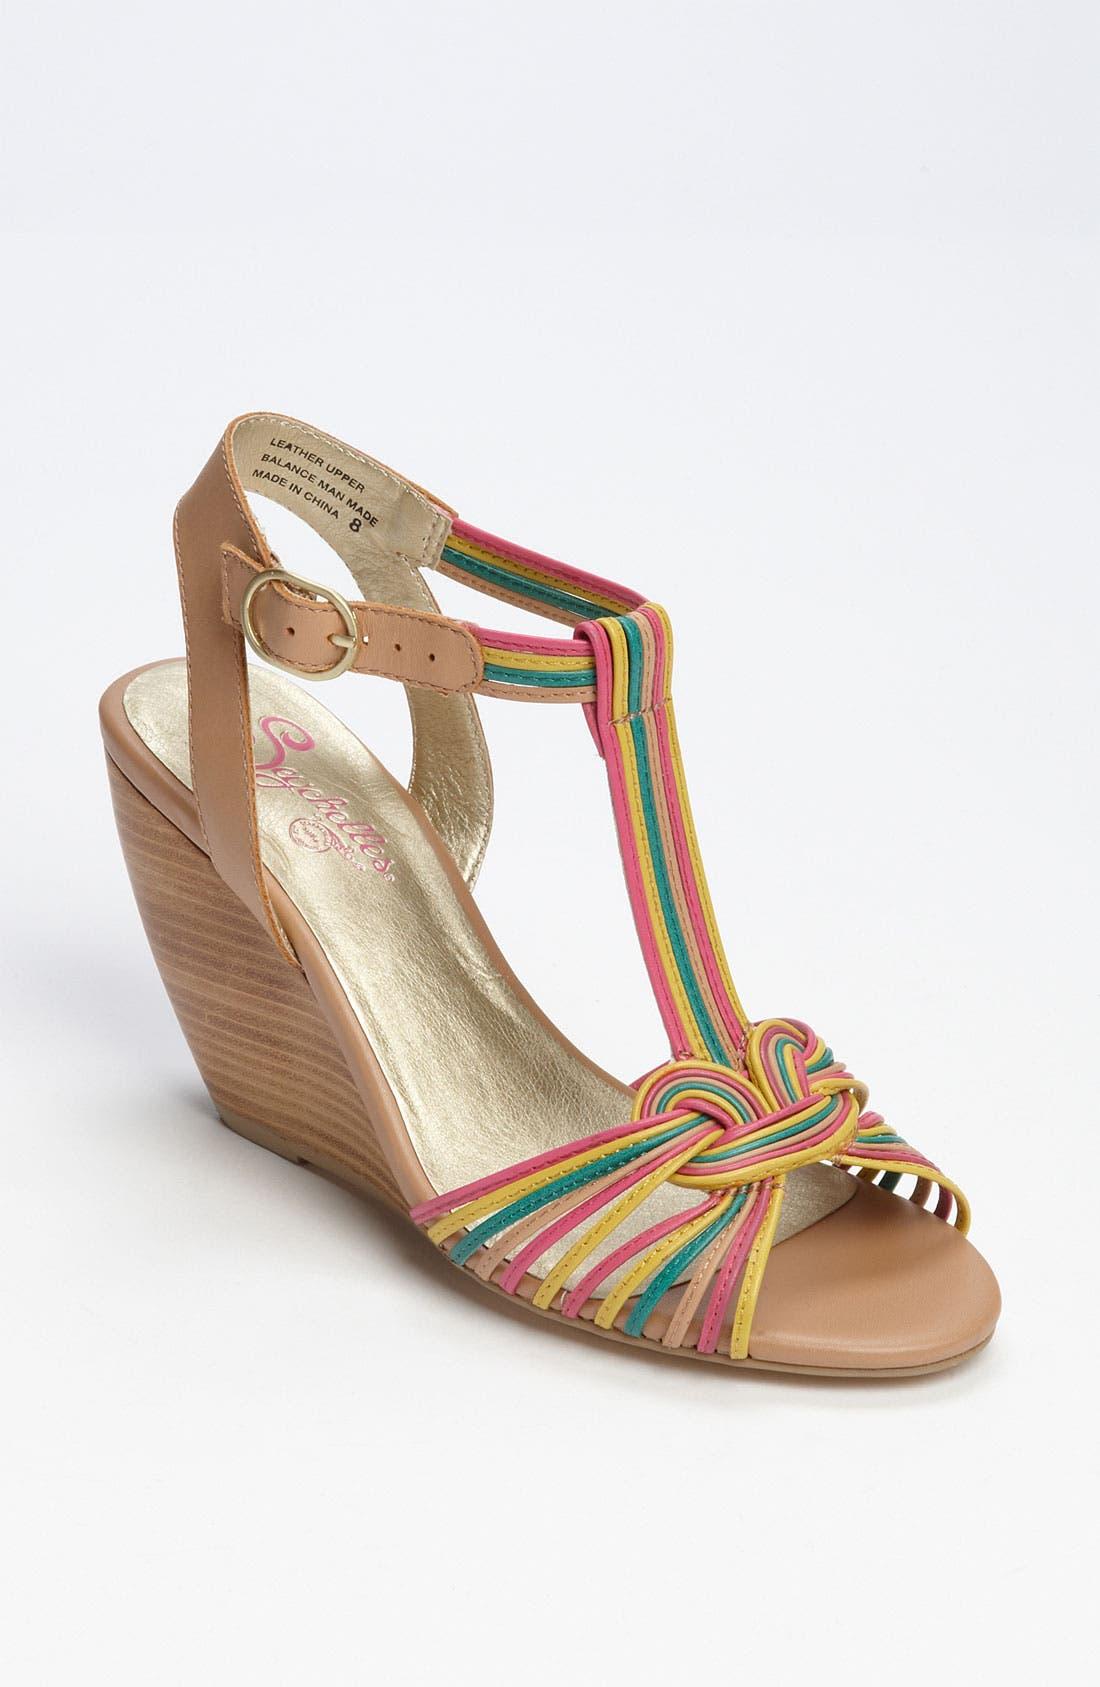 Alternate Image 1 Selected - Seychelles 'Good Ole Days' Sandal